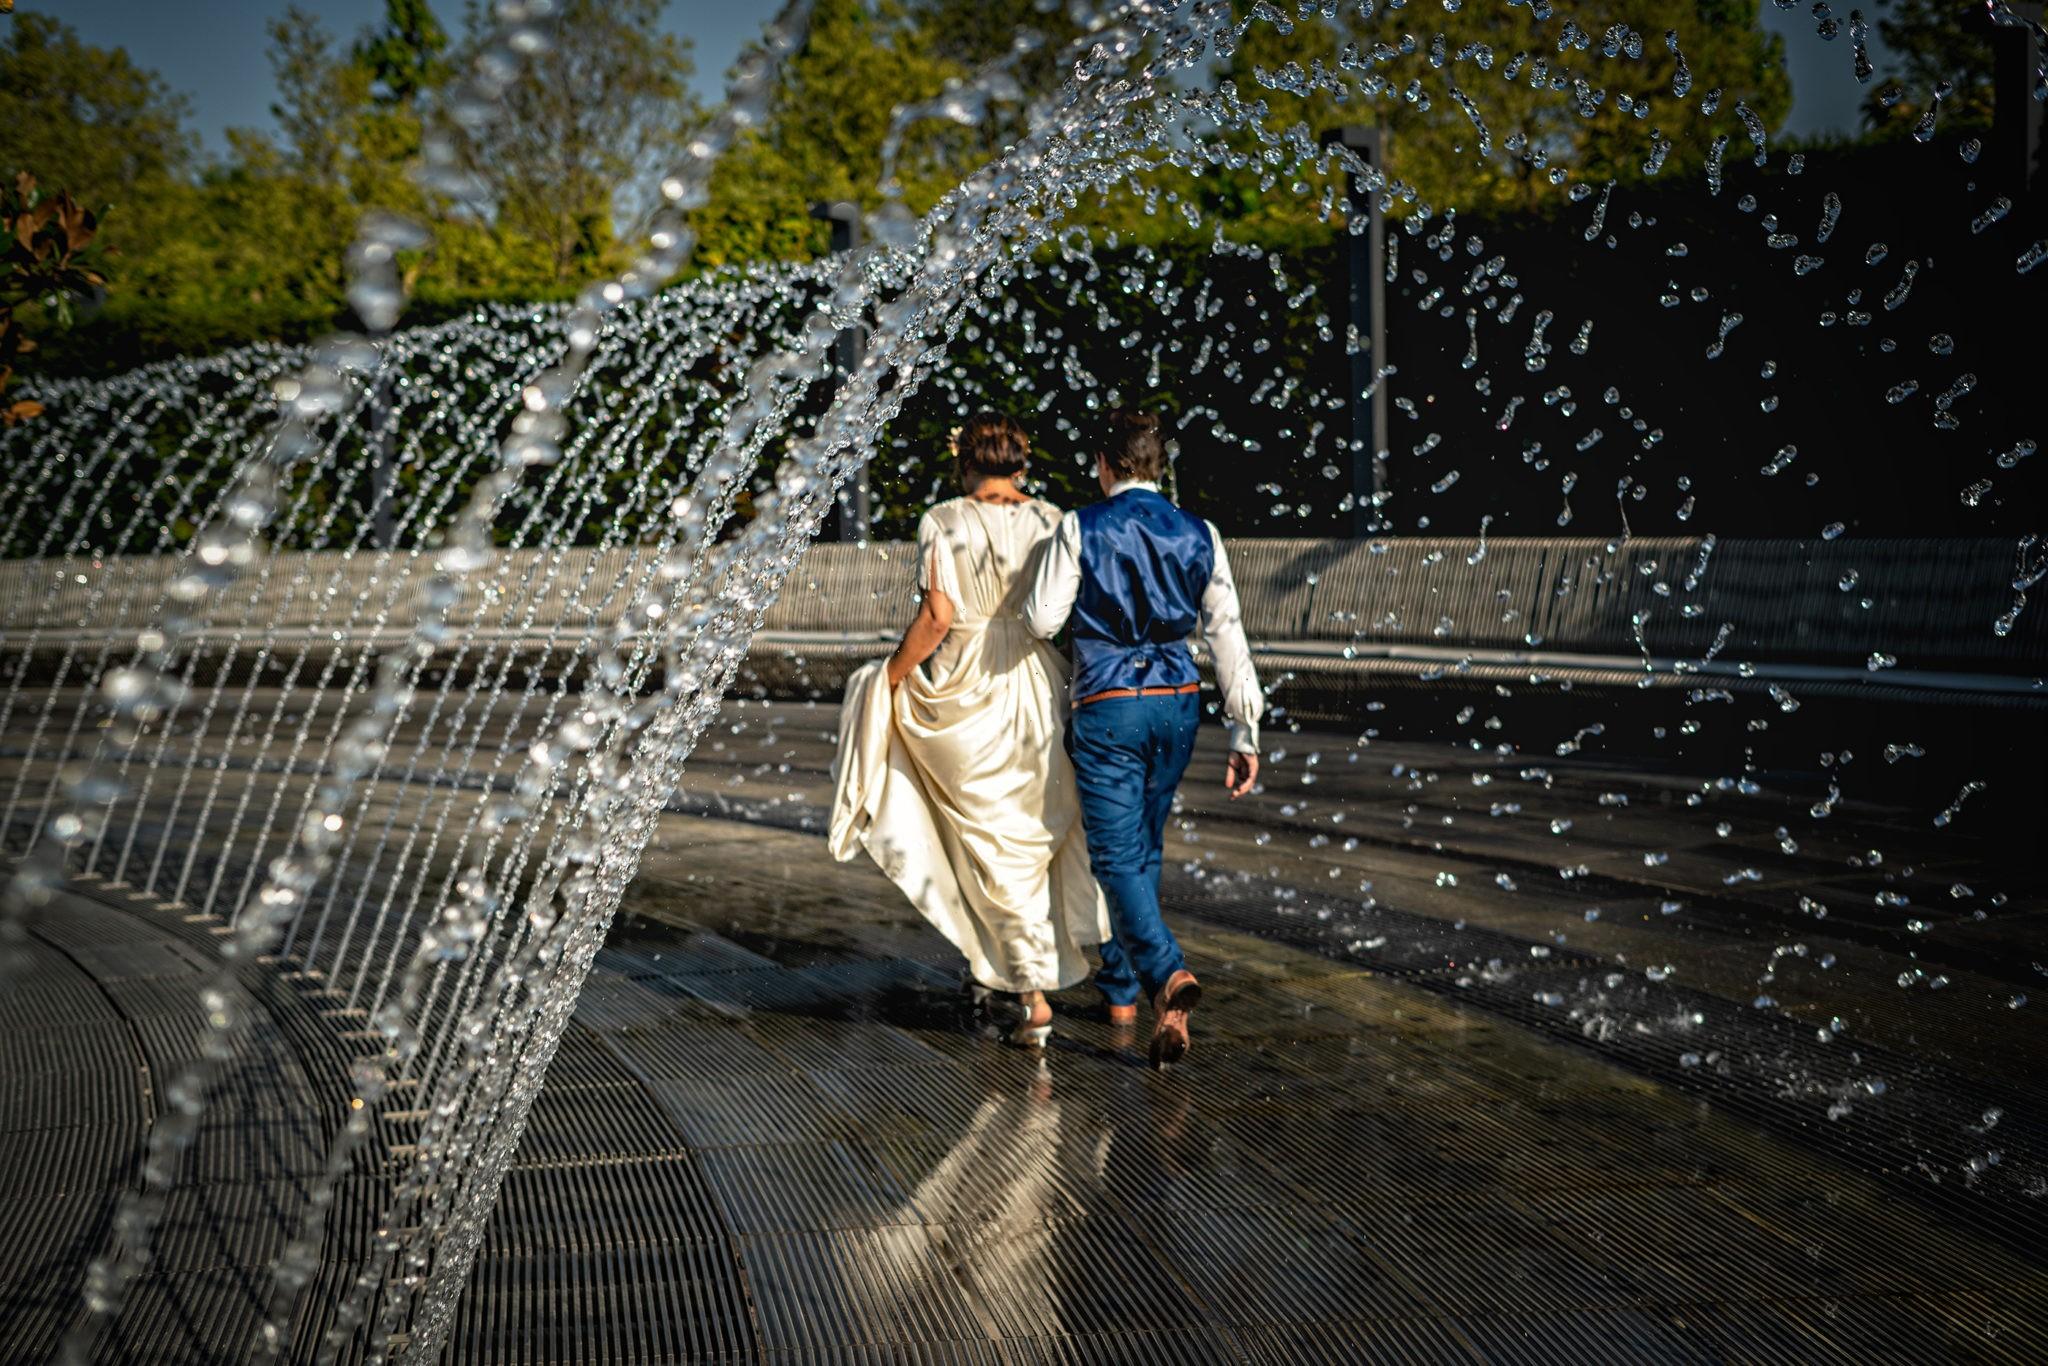 Парк Галицкого, фонтан арка, г Краснодар. Свадебная фотосъемка от Краснодарского свадебного фотографа в парке ФК Краснодар